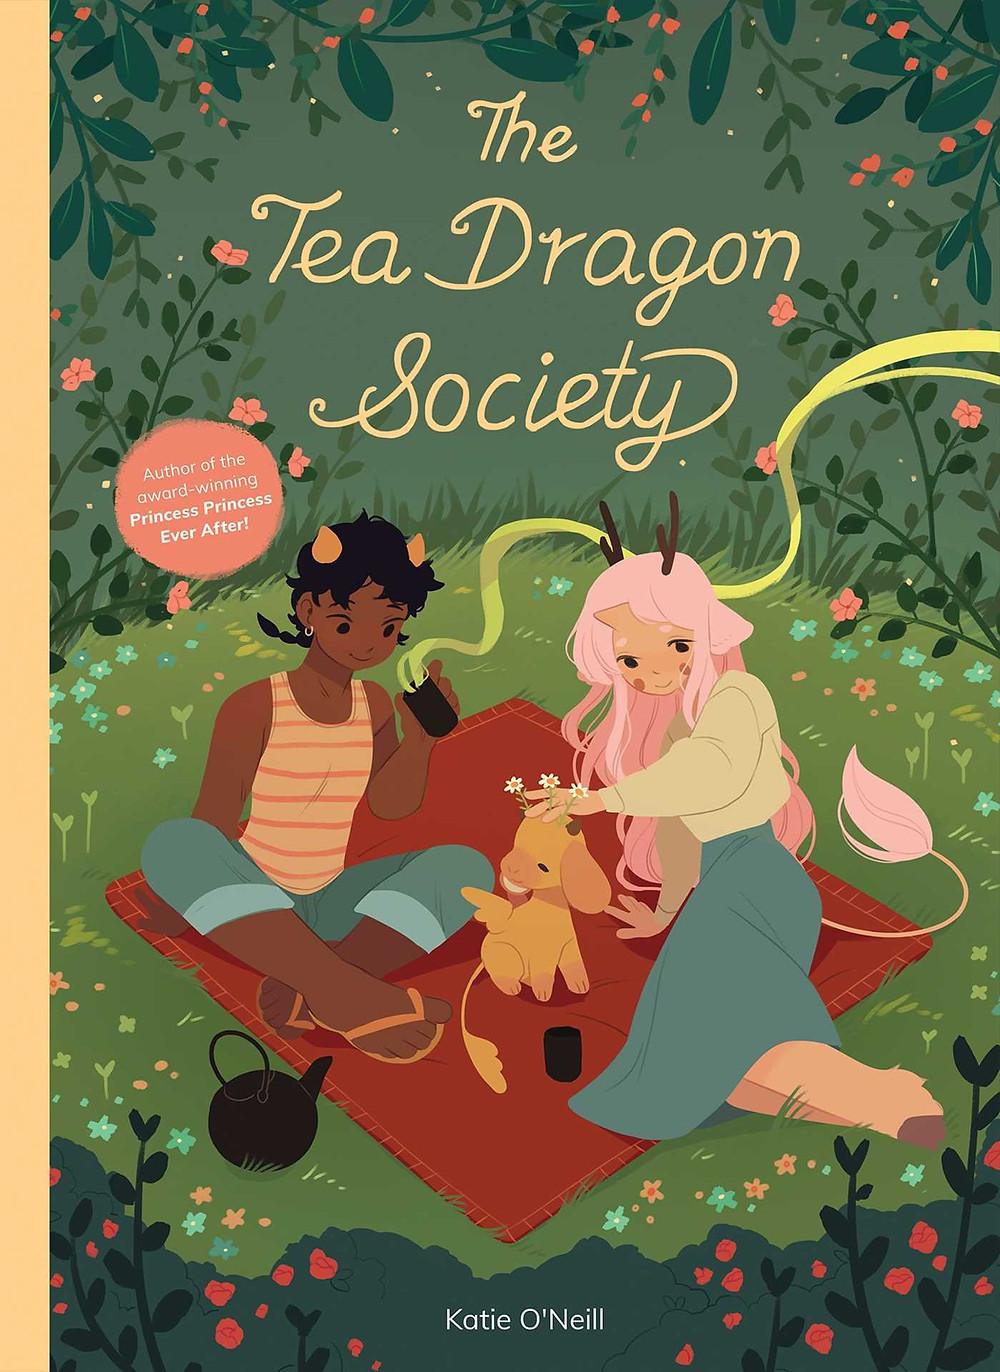 Cover of The Tea Dragon Society